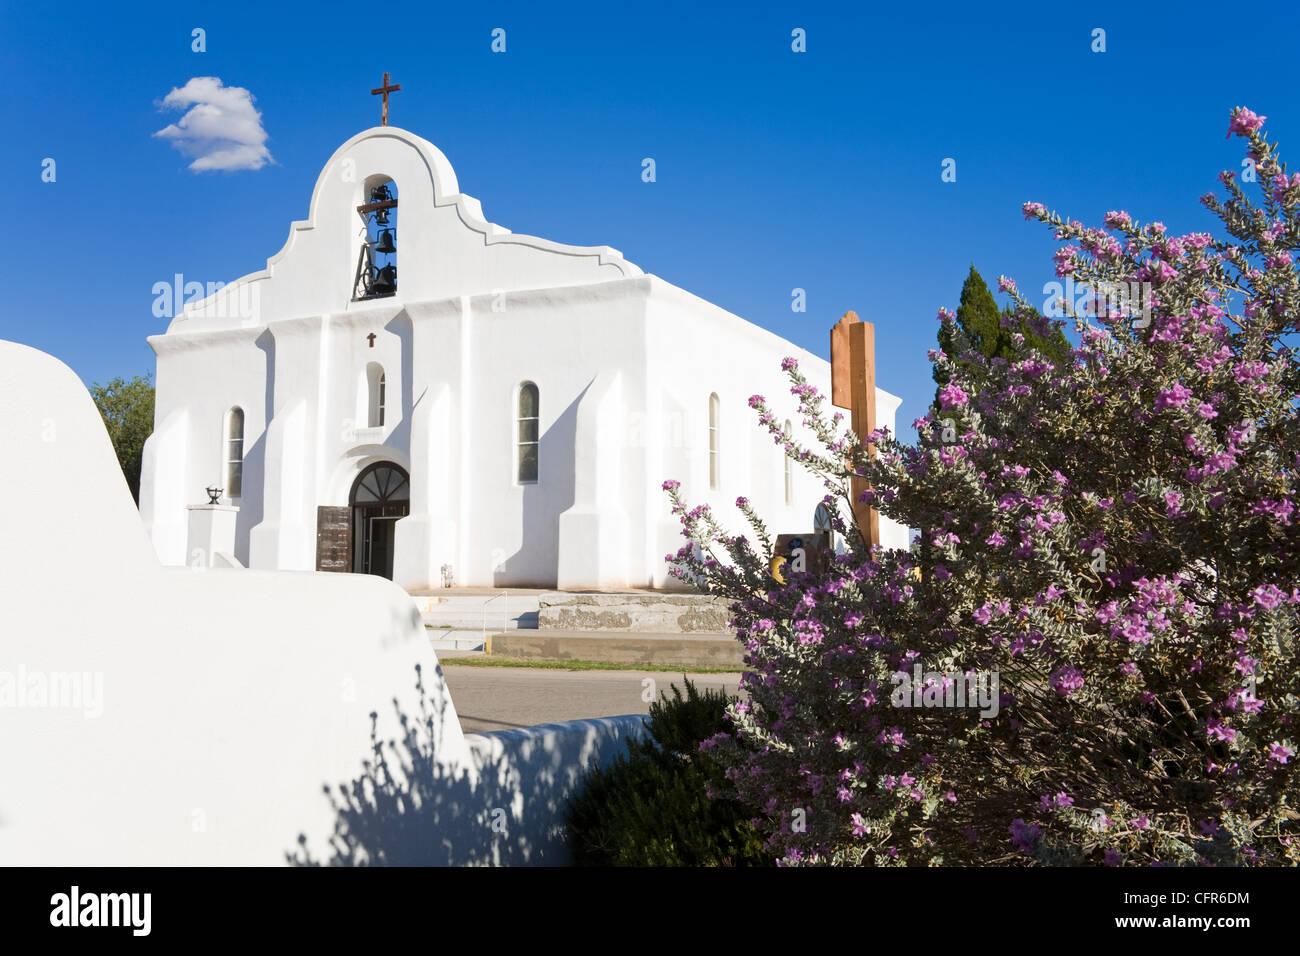 San Elizario Mission, El Paso, Texas, United States of America, North America - Stock Image